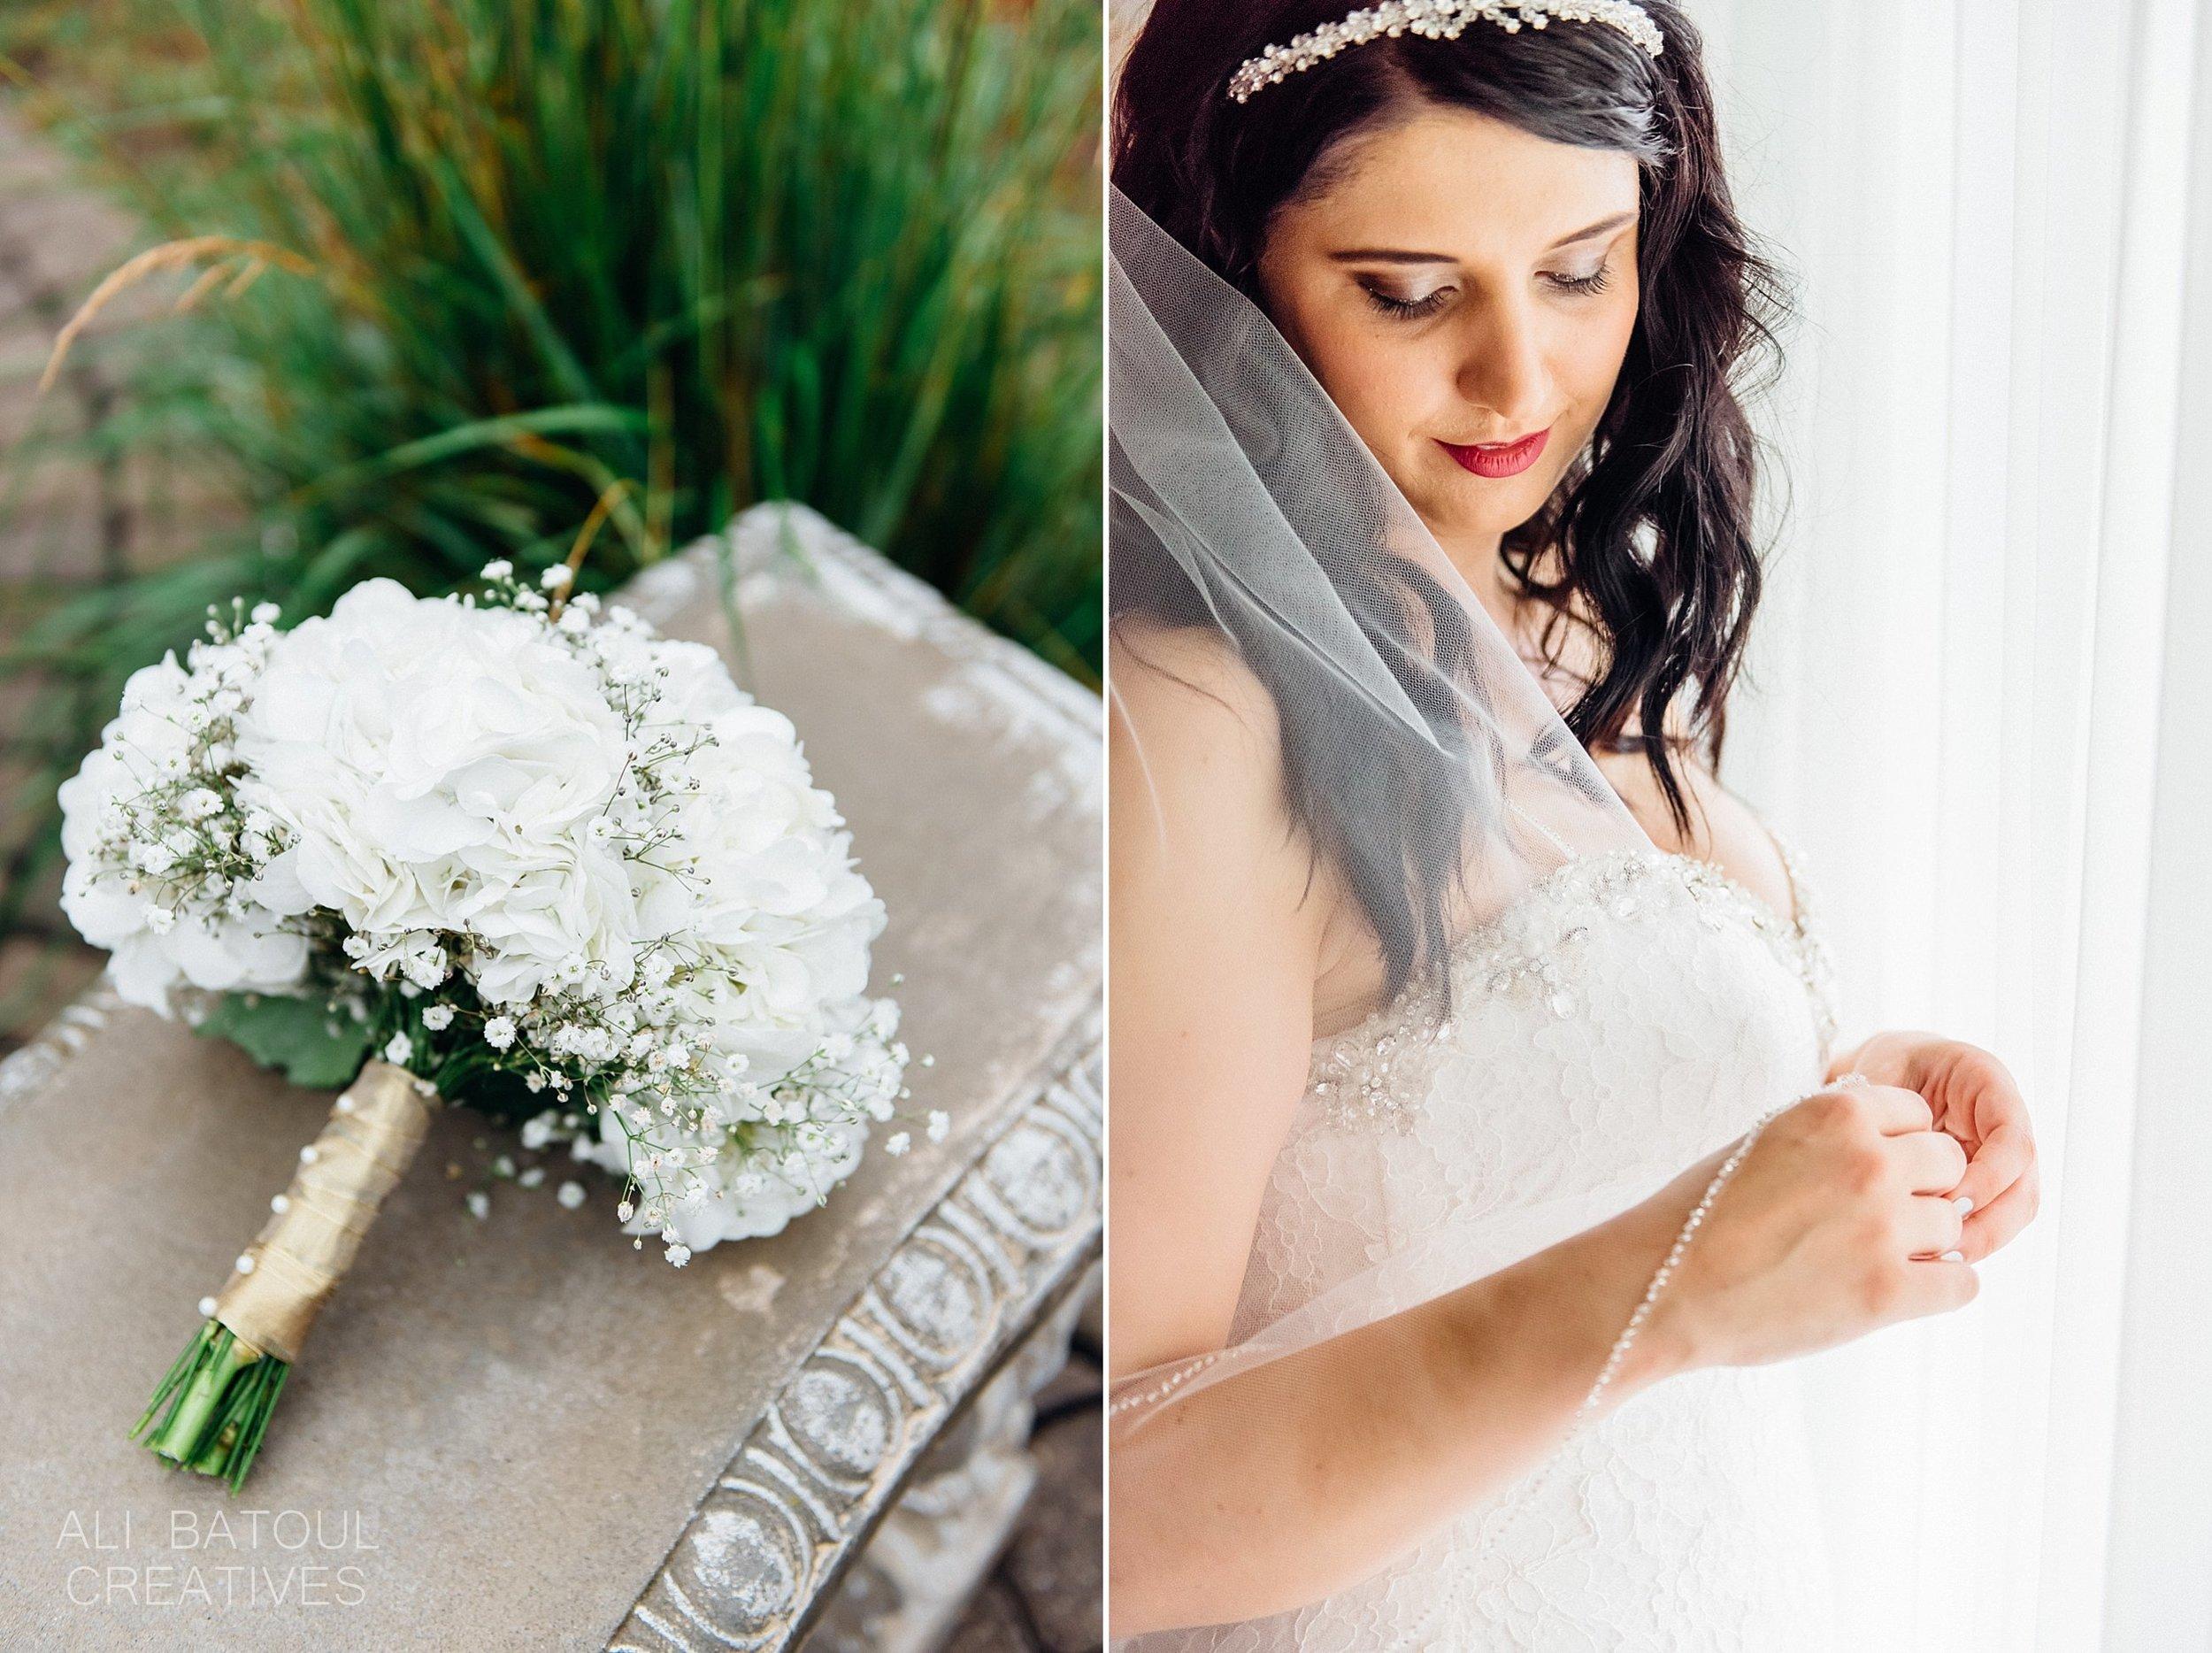 Jocelyn + Steve At The Schoolhouse Wedding - Ali and Batoul Fine Art Wedding Photography_0009.jpg